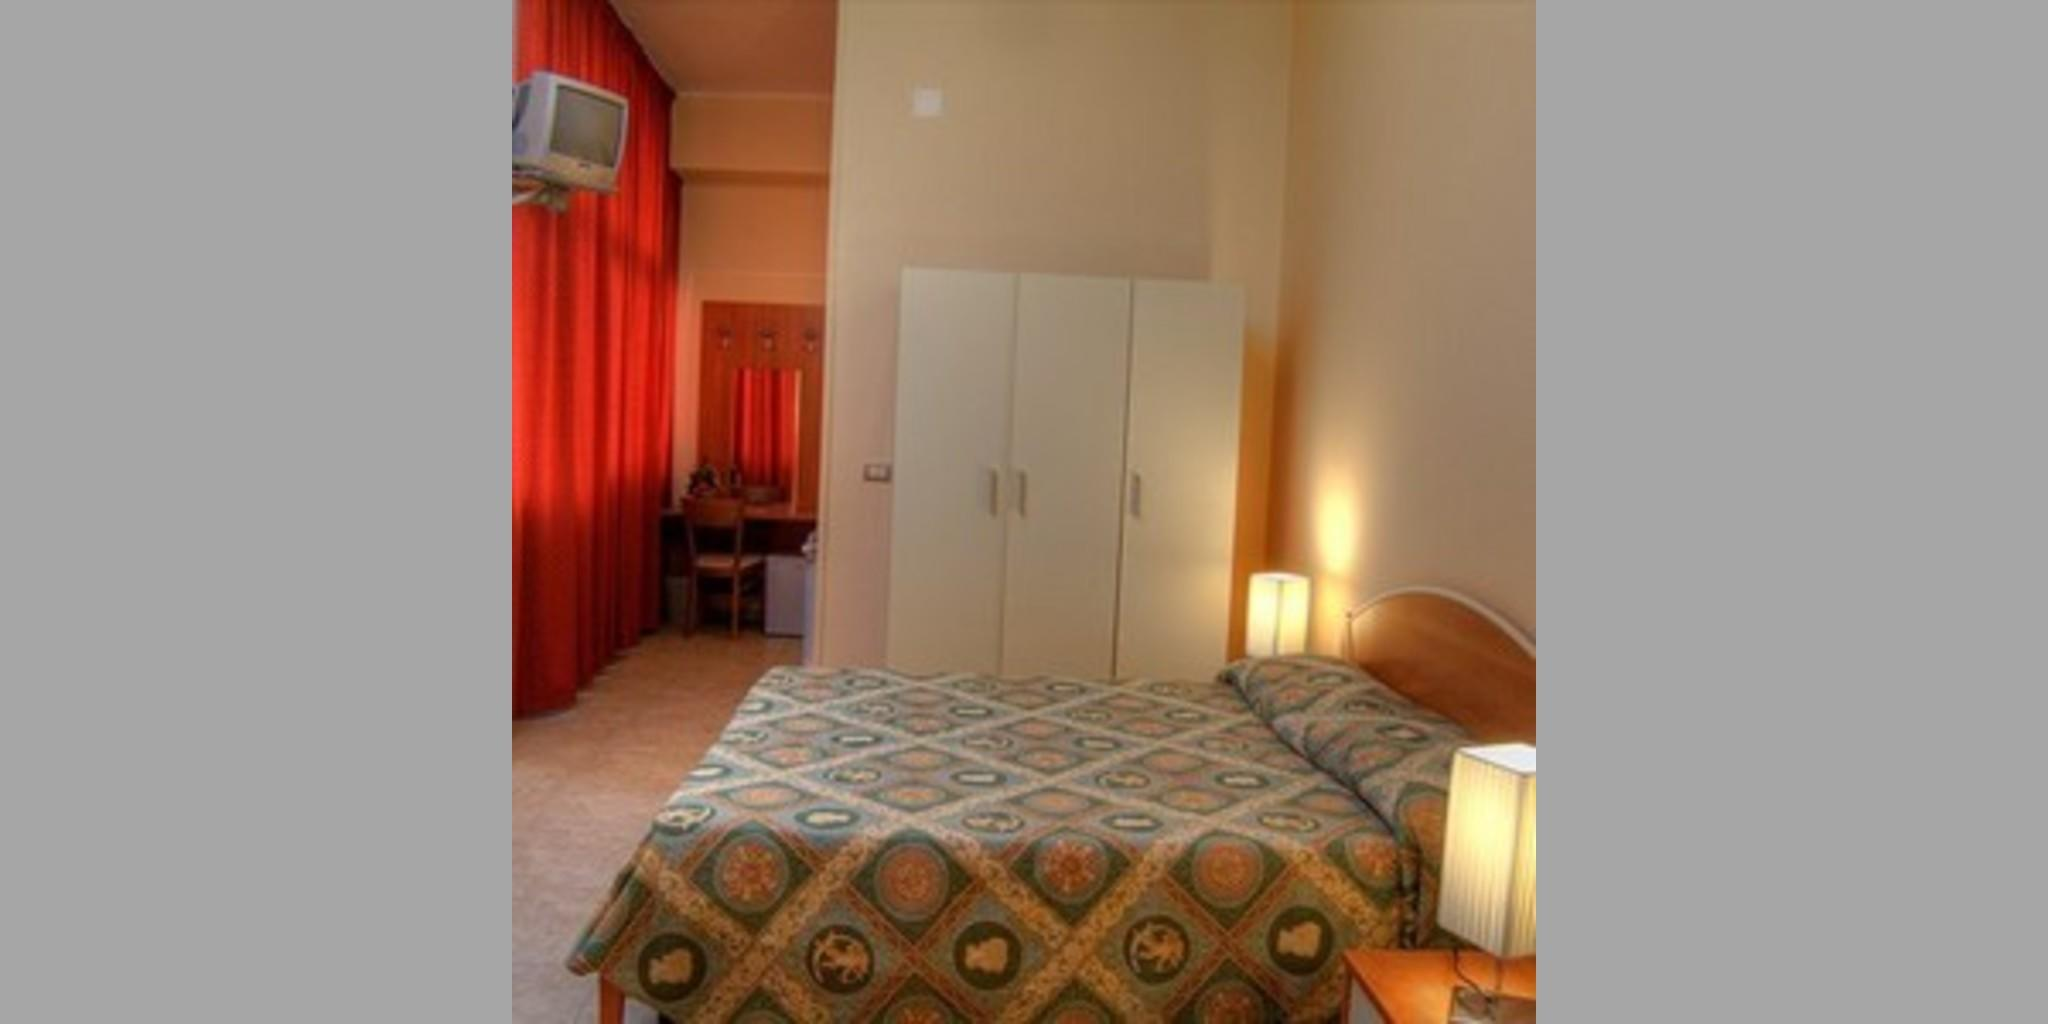 Bed & Breakfast Belpasso - Belpasso  Parco Dell'etna